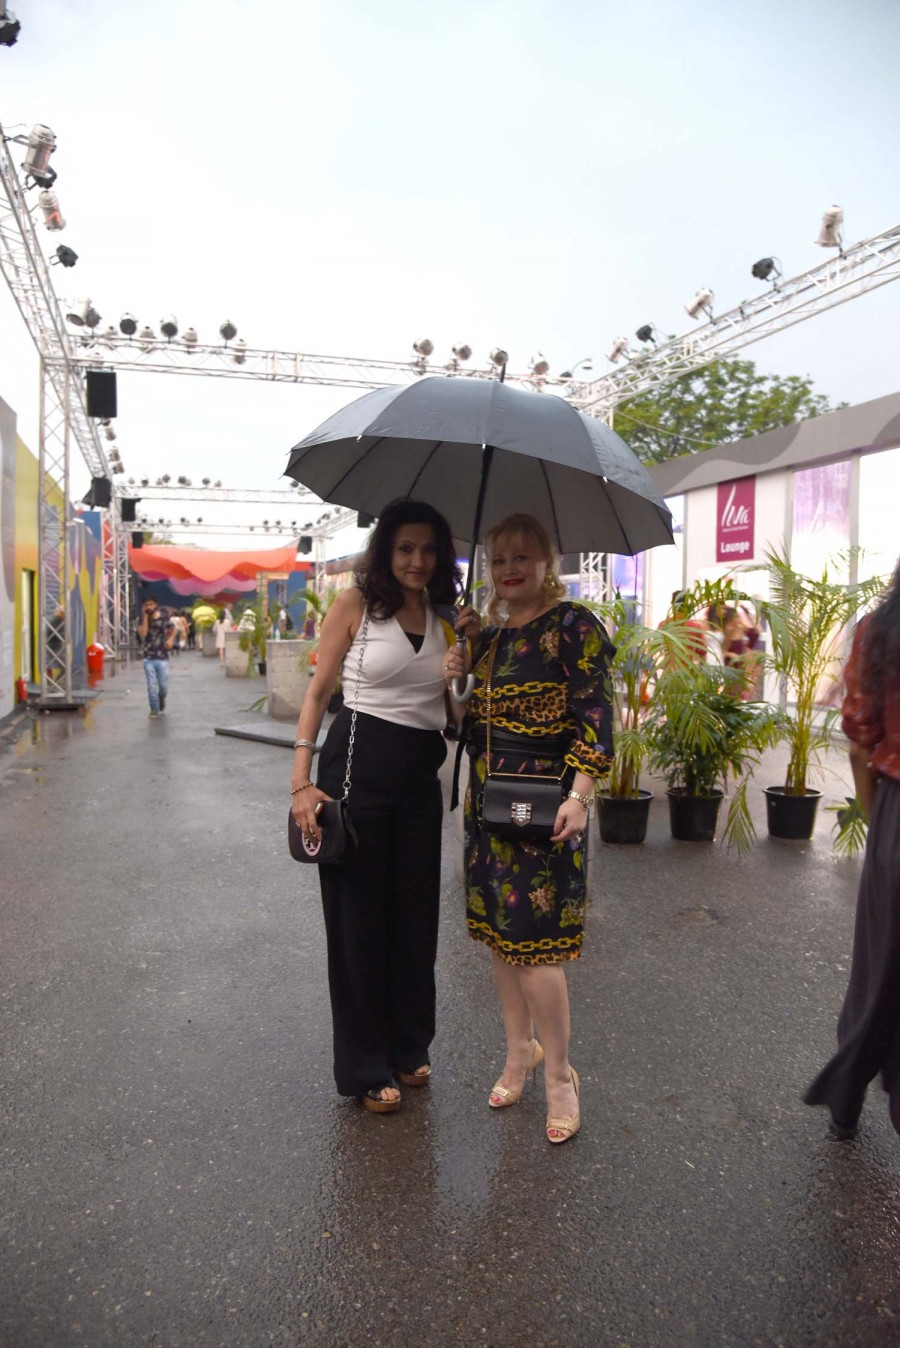 AIFW 2016,AIFW,Rain drains out fun from AIFW 2016,Amazon India Fashion Week,Amazon India Fashion Week 2016,Autumn-Winter 2016,Autumn-Winter